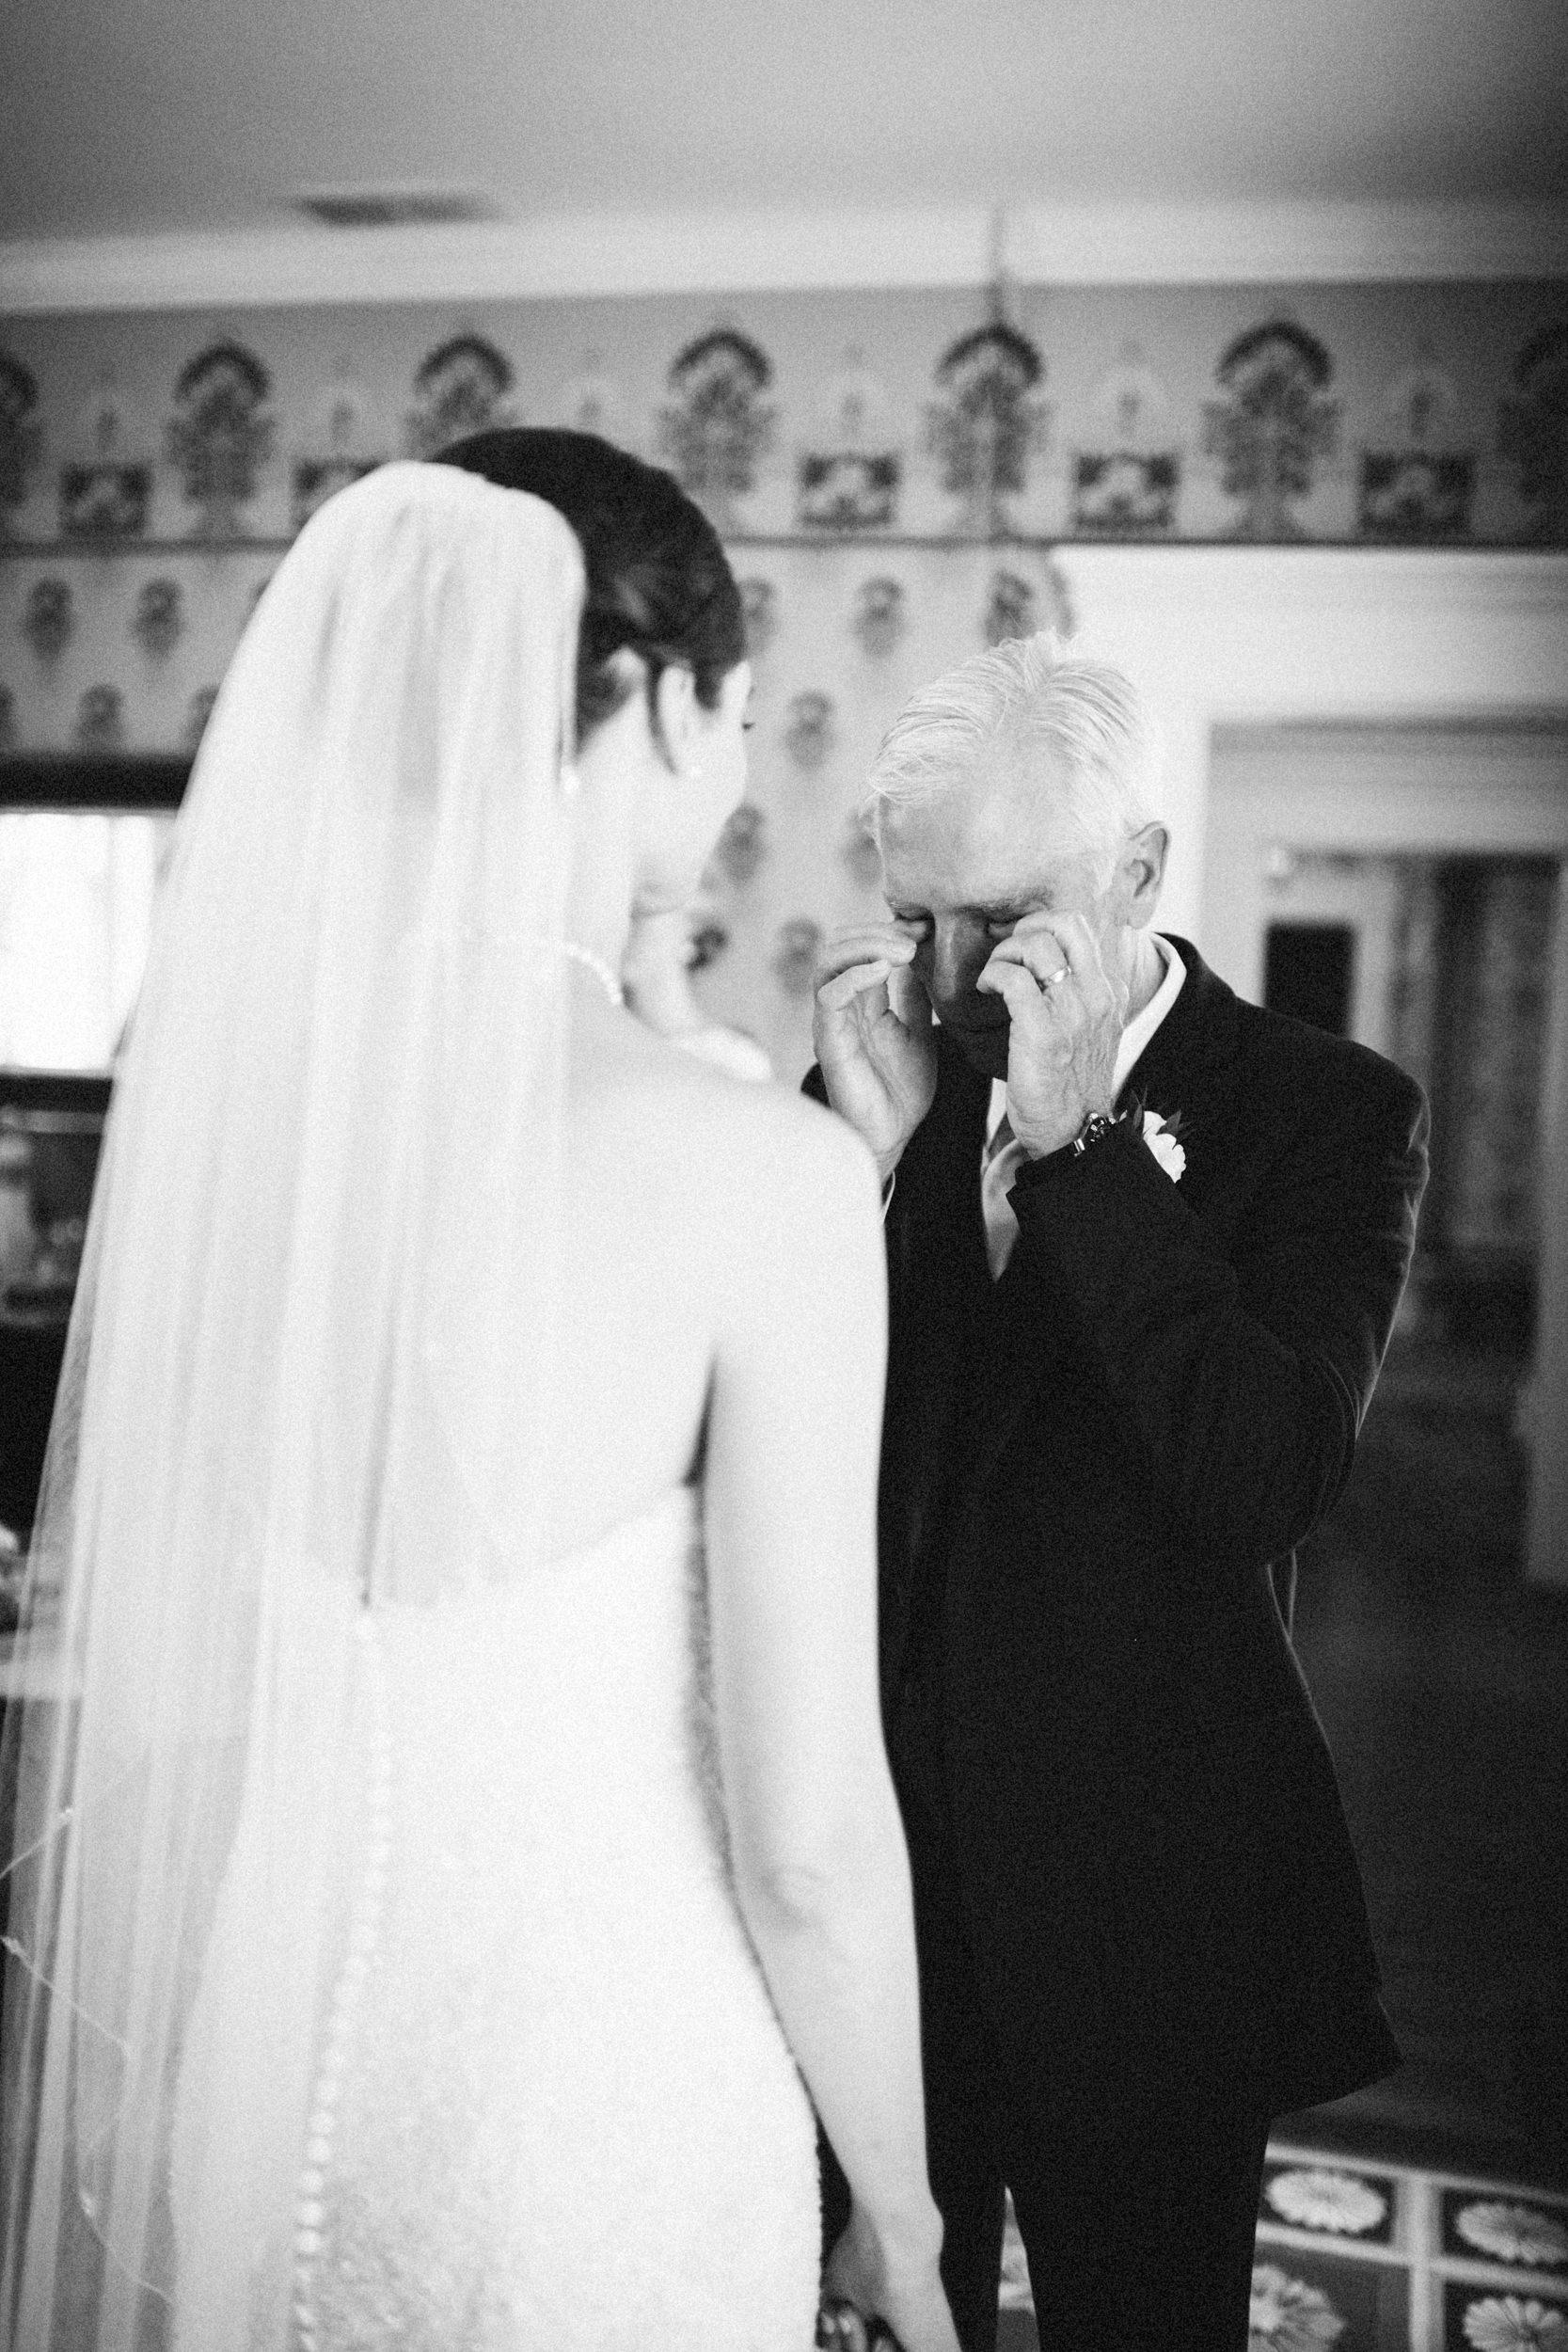 Louisville-Kentucky-Wedding-Elopement-Photographer-Sarah-Katherine-Davis-Photography-Whitehall-Classic-Timeless-Garden-Wedding-174.jpg